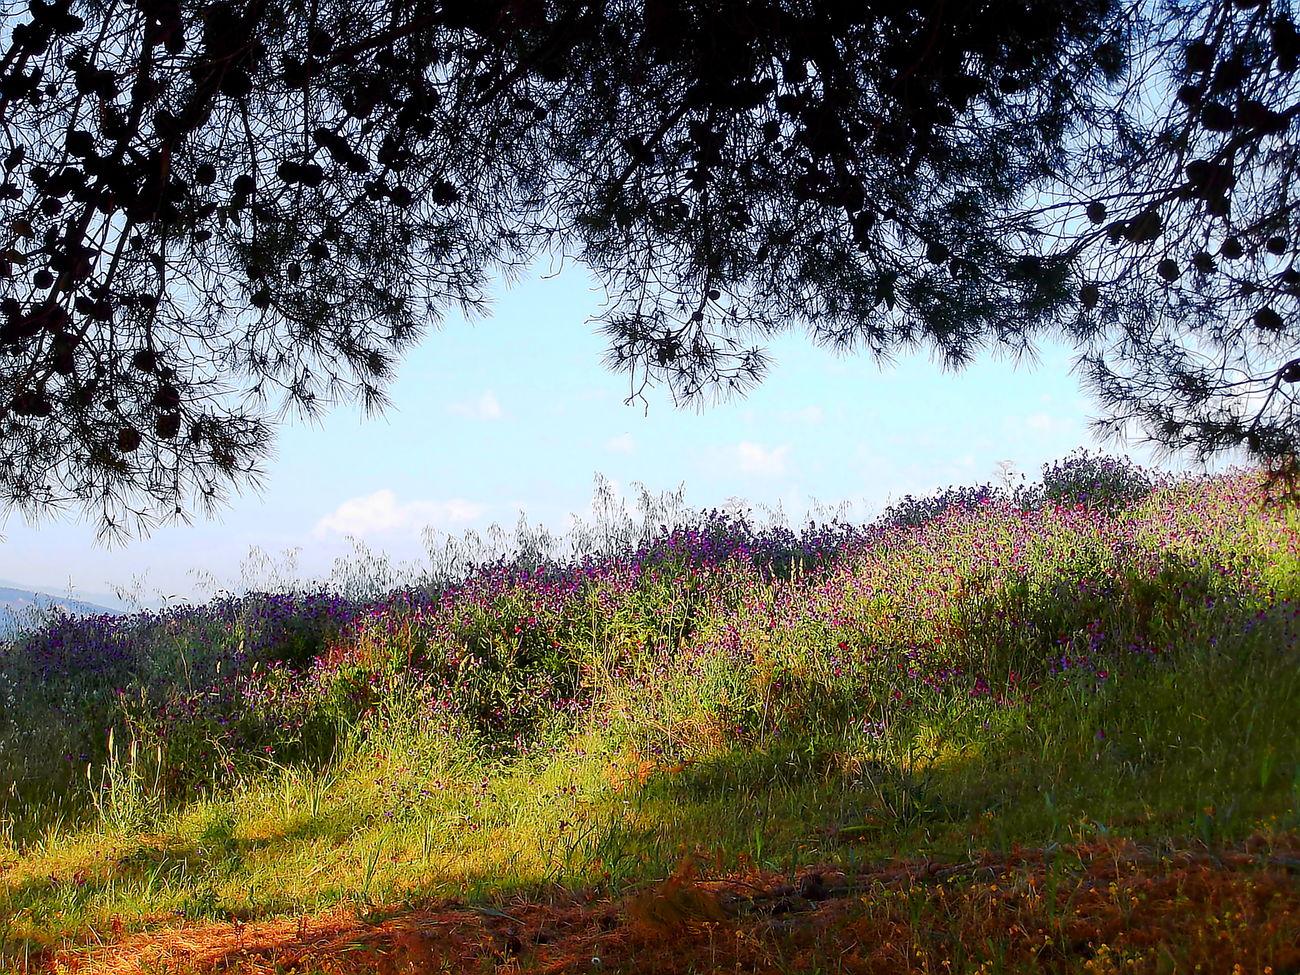 Agrigento Alberi Beauty In Nature Cielo Azzurro Erba Field Fiori Flower Fragility Freshness Growth Nature No People Nuvole Outdoors Plant Scenics Sicilia Silohuette Tranquility Tree Vegetazione